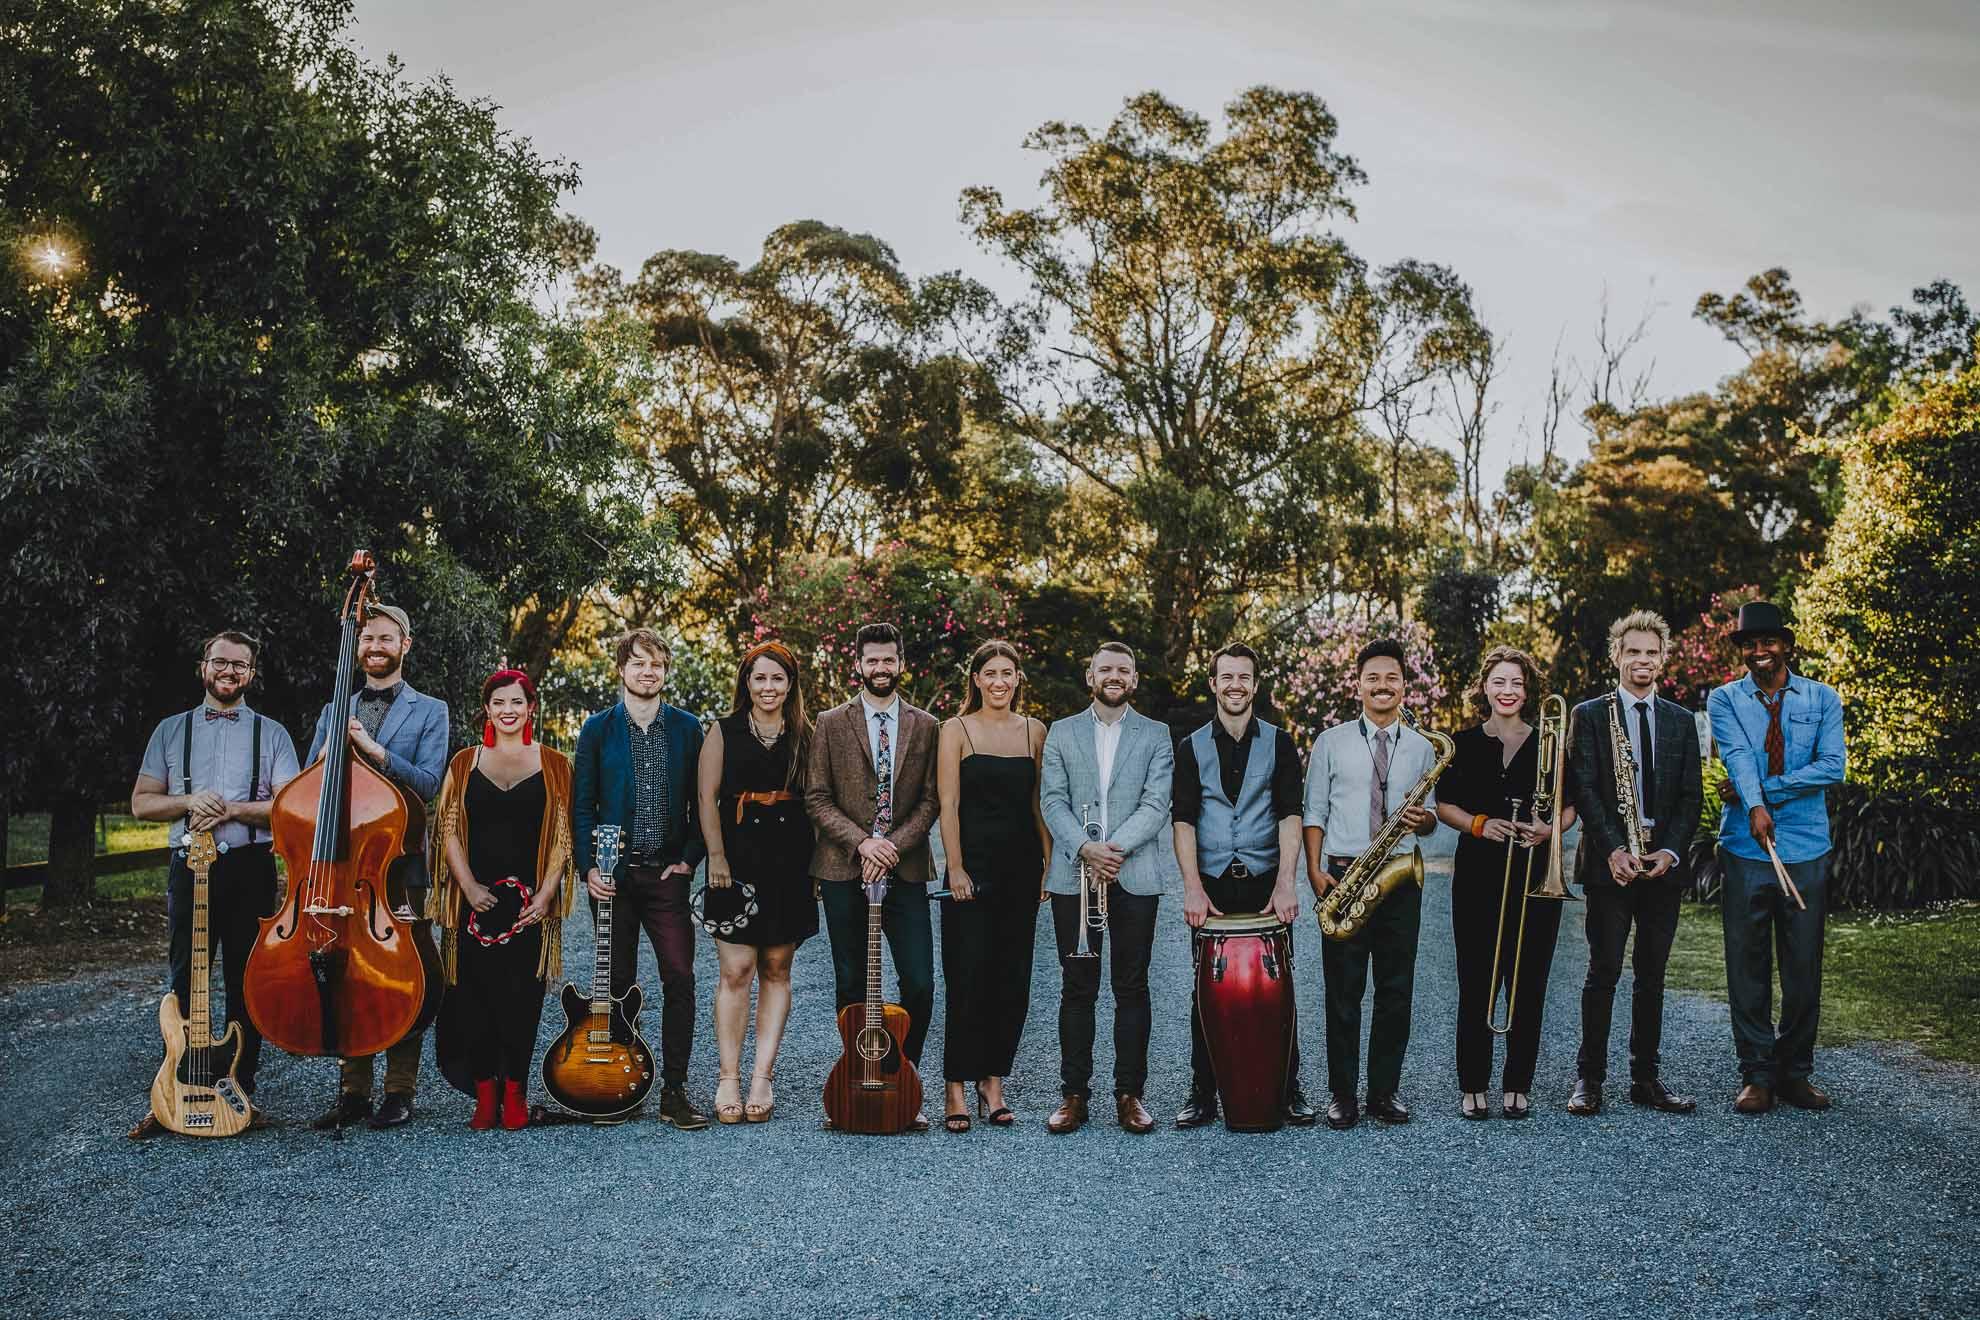 Baker Boys Band lesbian LGBTQIA+ Melbourne Sydney Australia wide wedding musicians entertainment videographers Dancing With Her